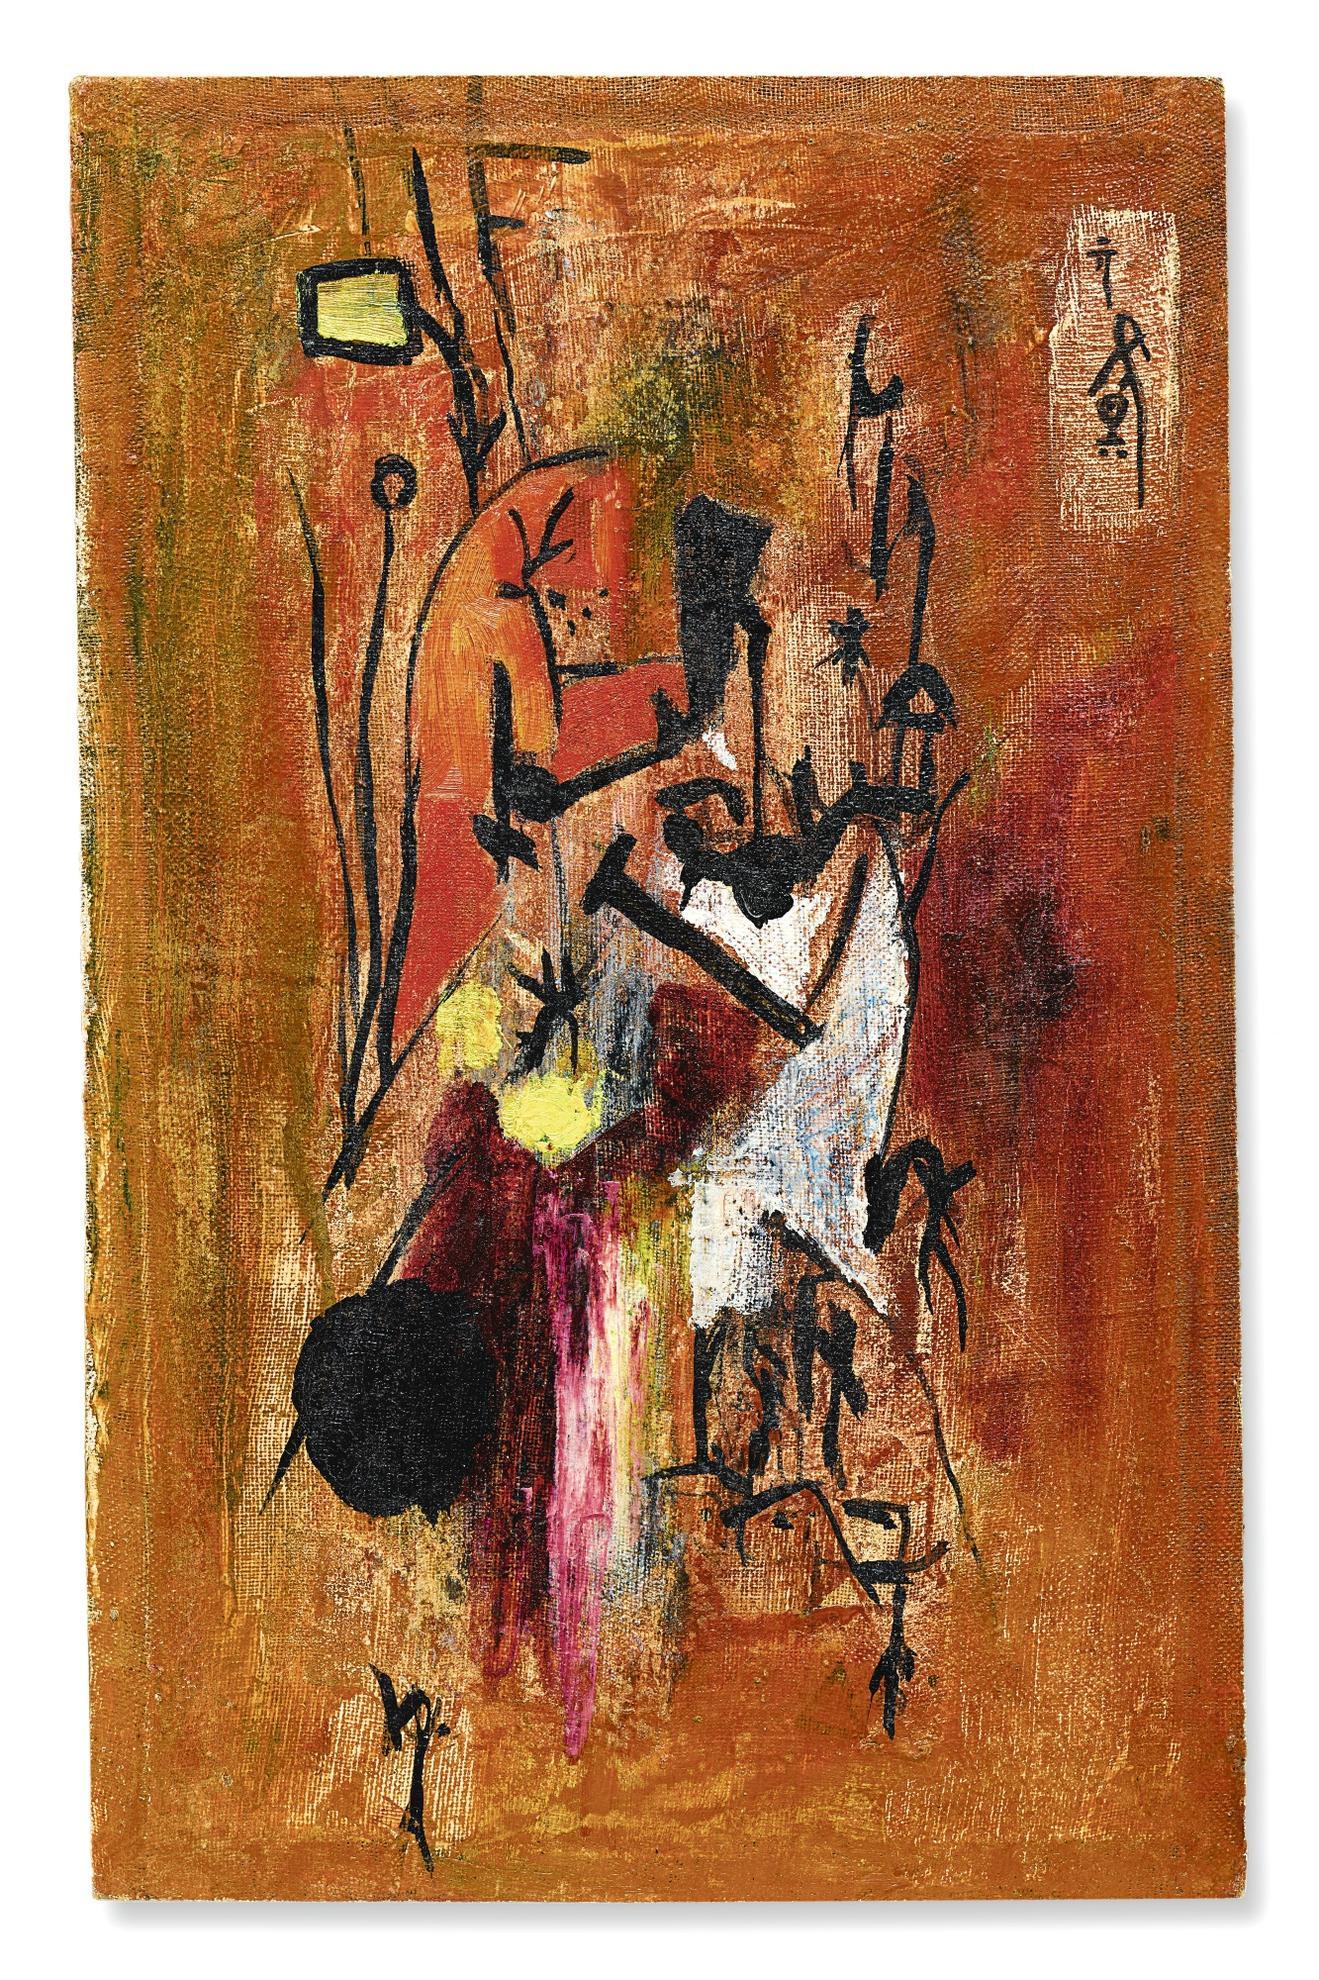 Li Yuan-Chia-Senza Titolo-1957